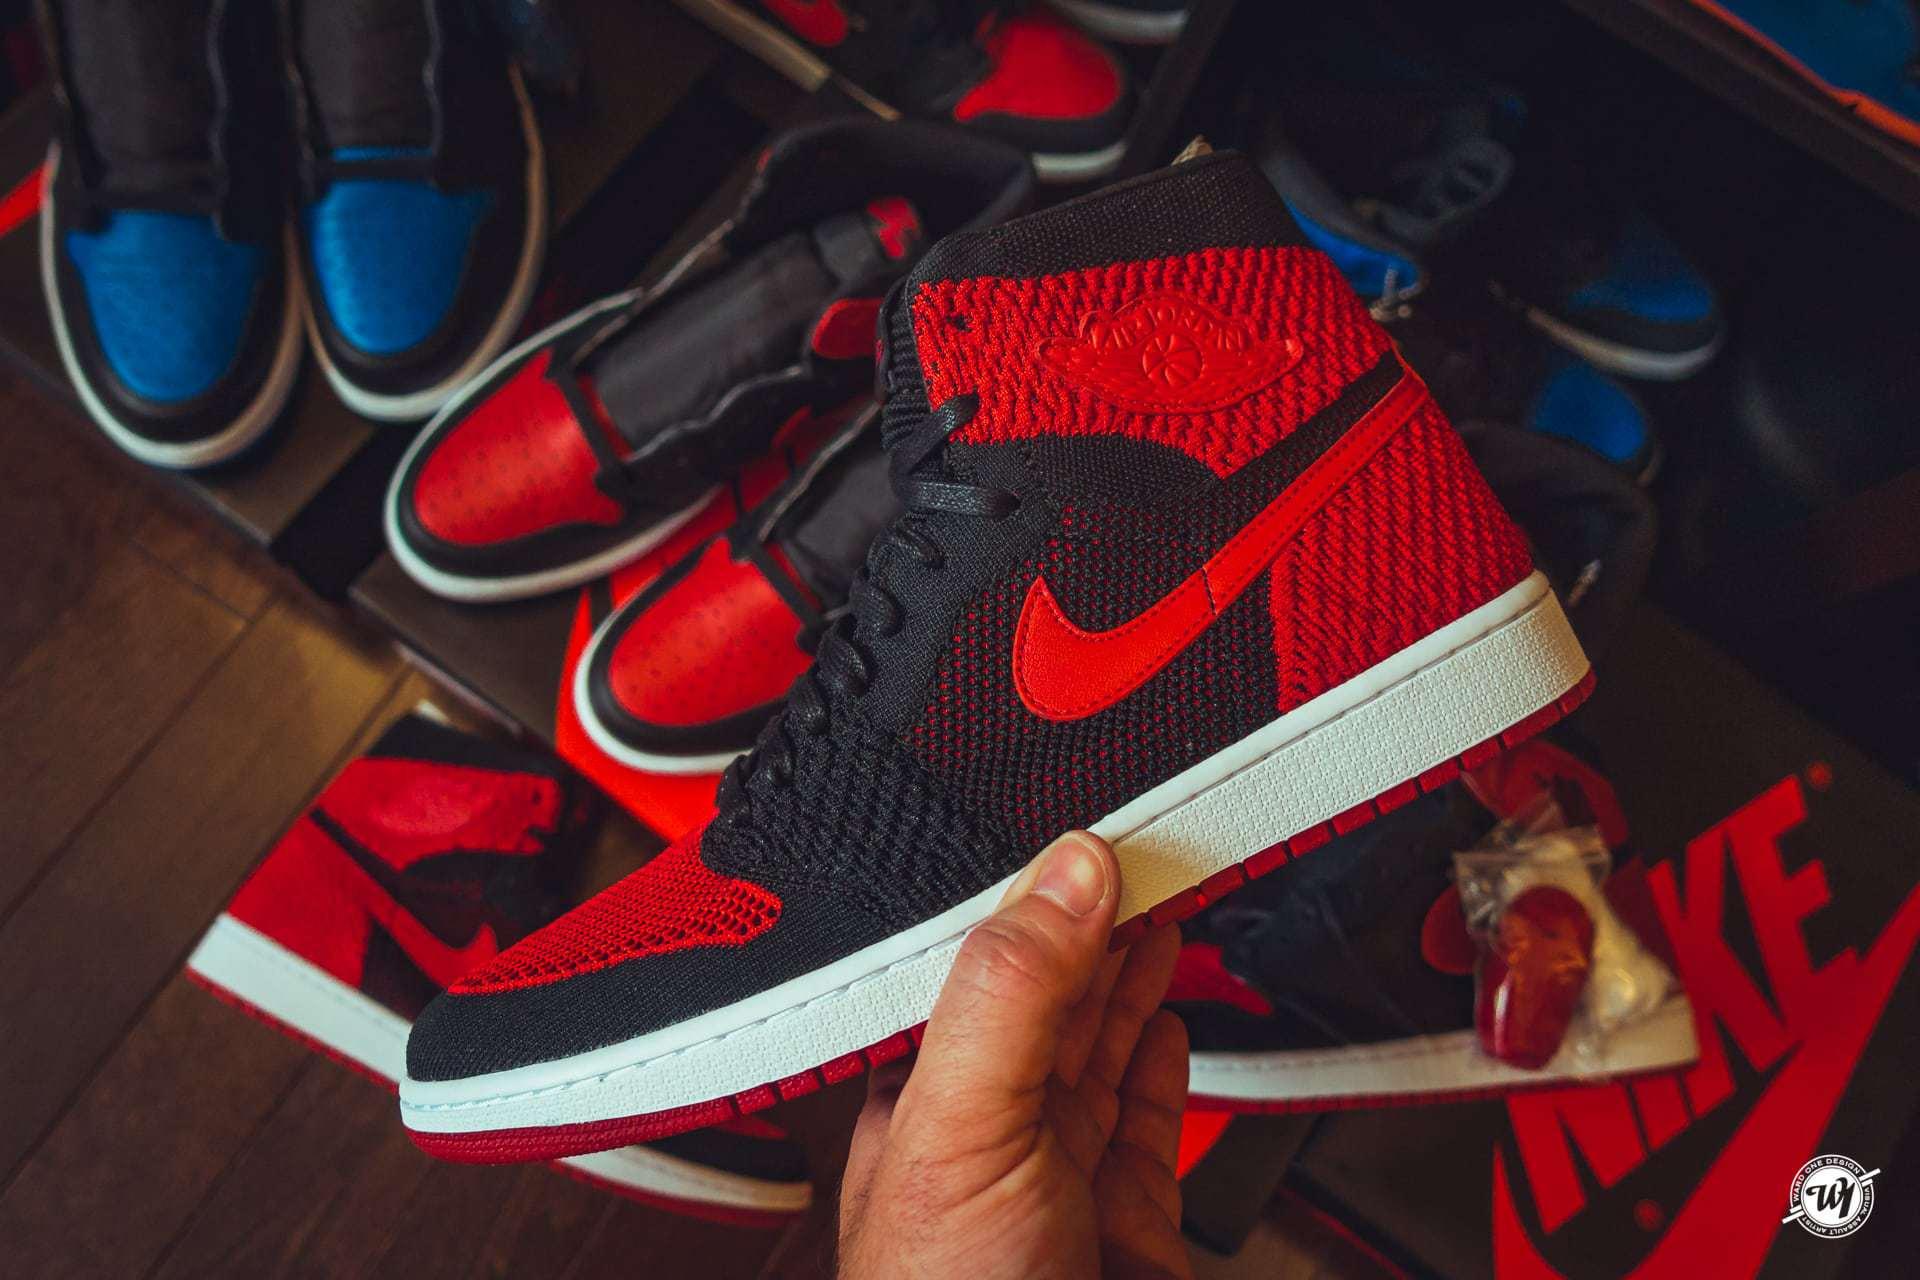 Air Jordan 1 Flyknit • Banned Ward 1 Shoes